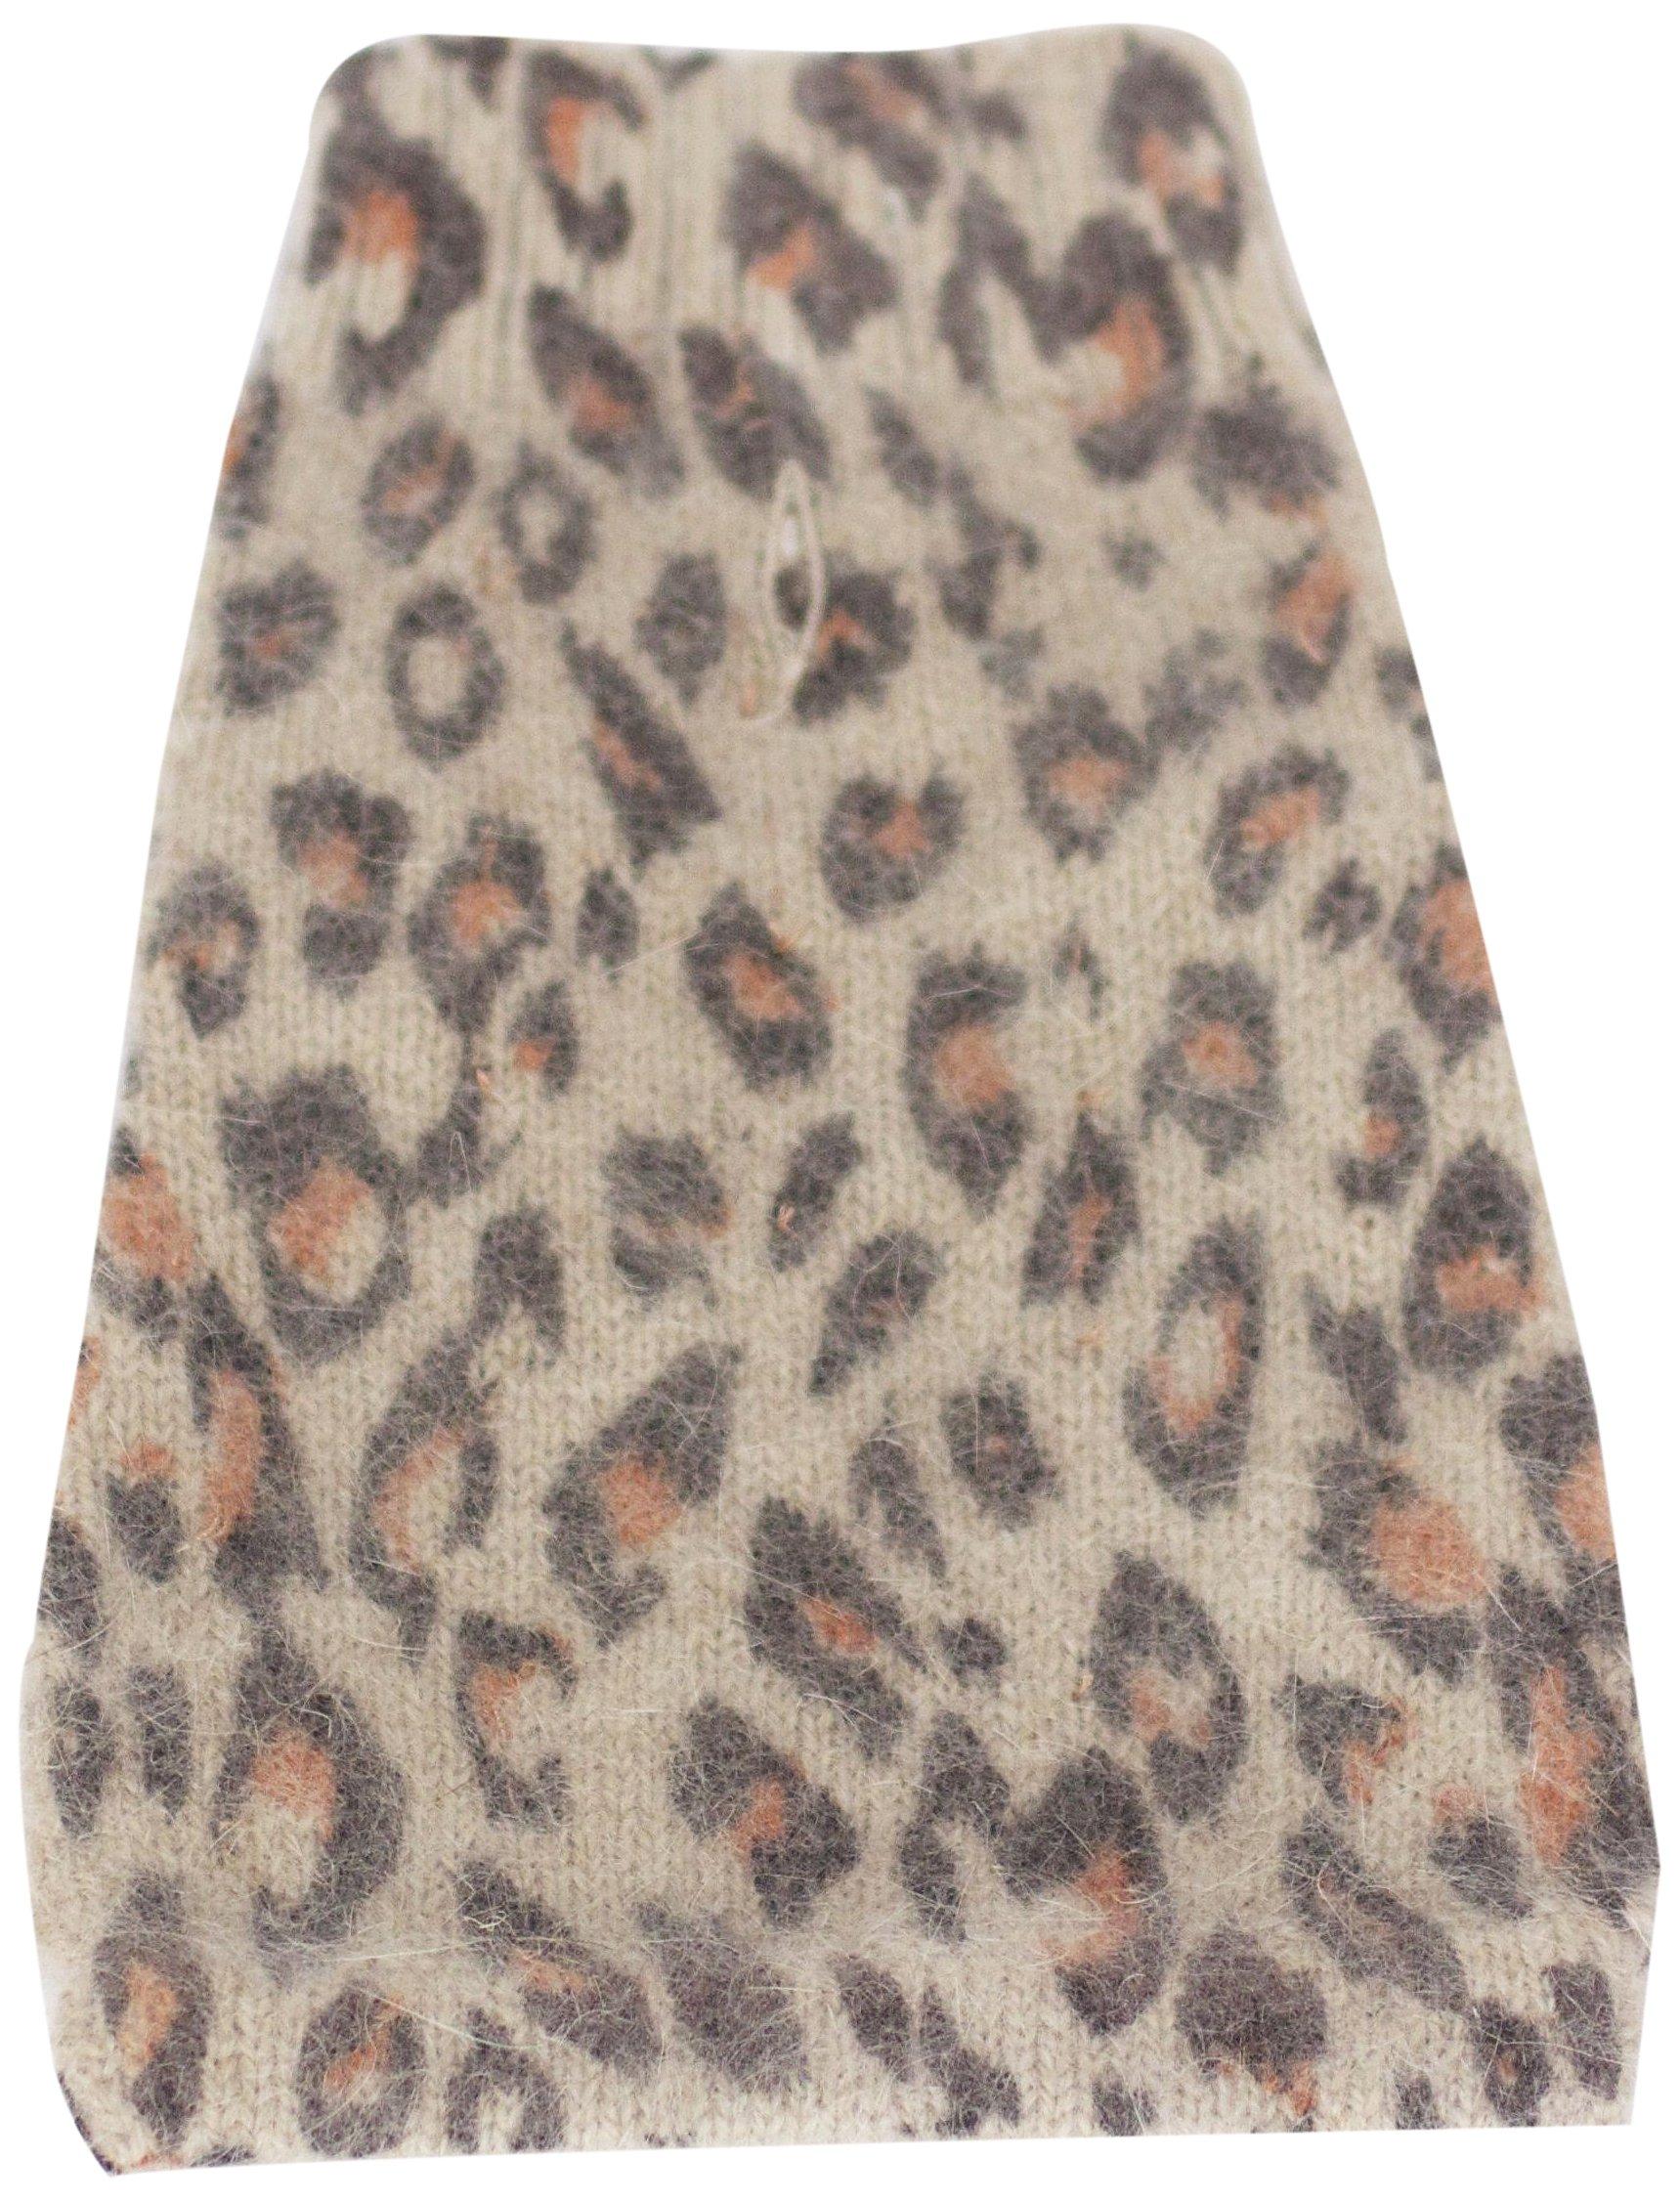 The Dog Squad Animal Instincts Mock Neck Pet Sweater, Medium, Brown Leopard